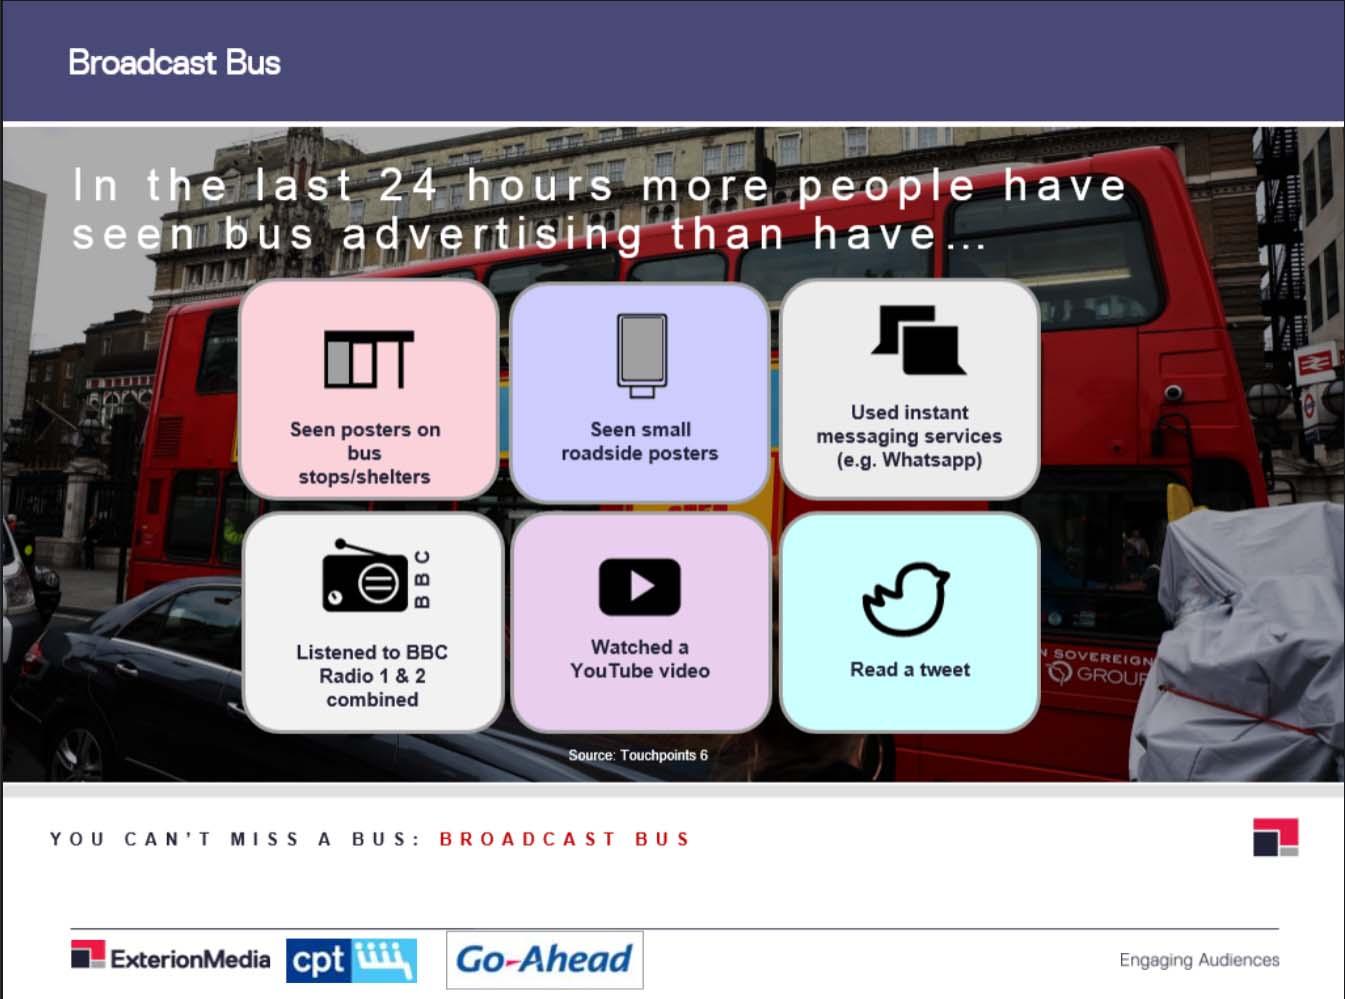 Broadcast Bus